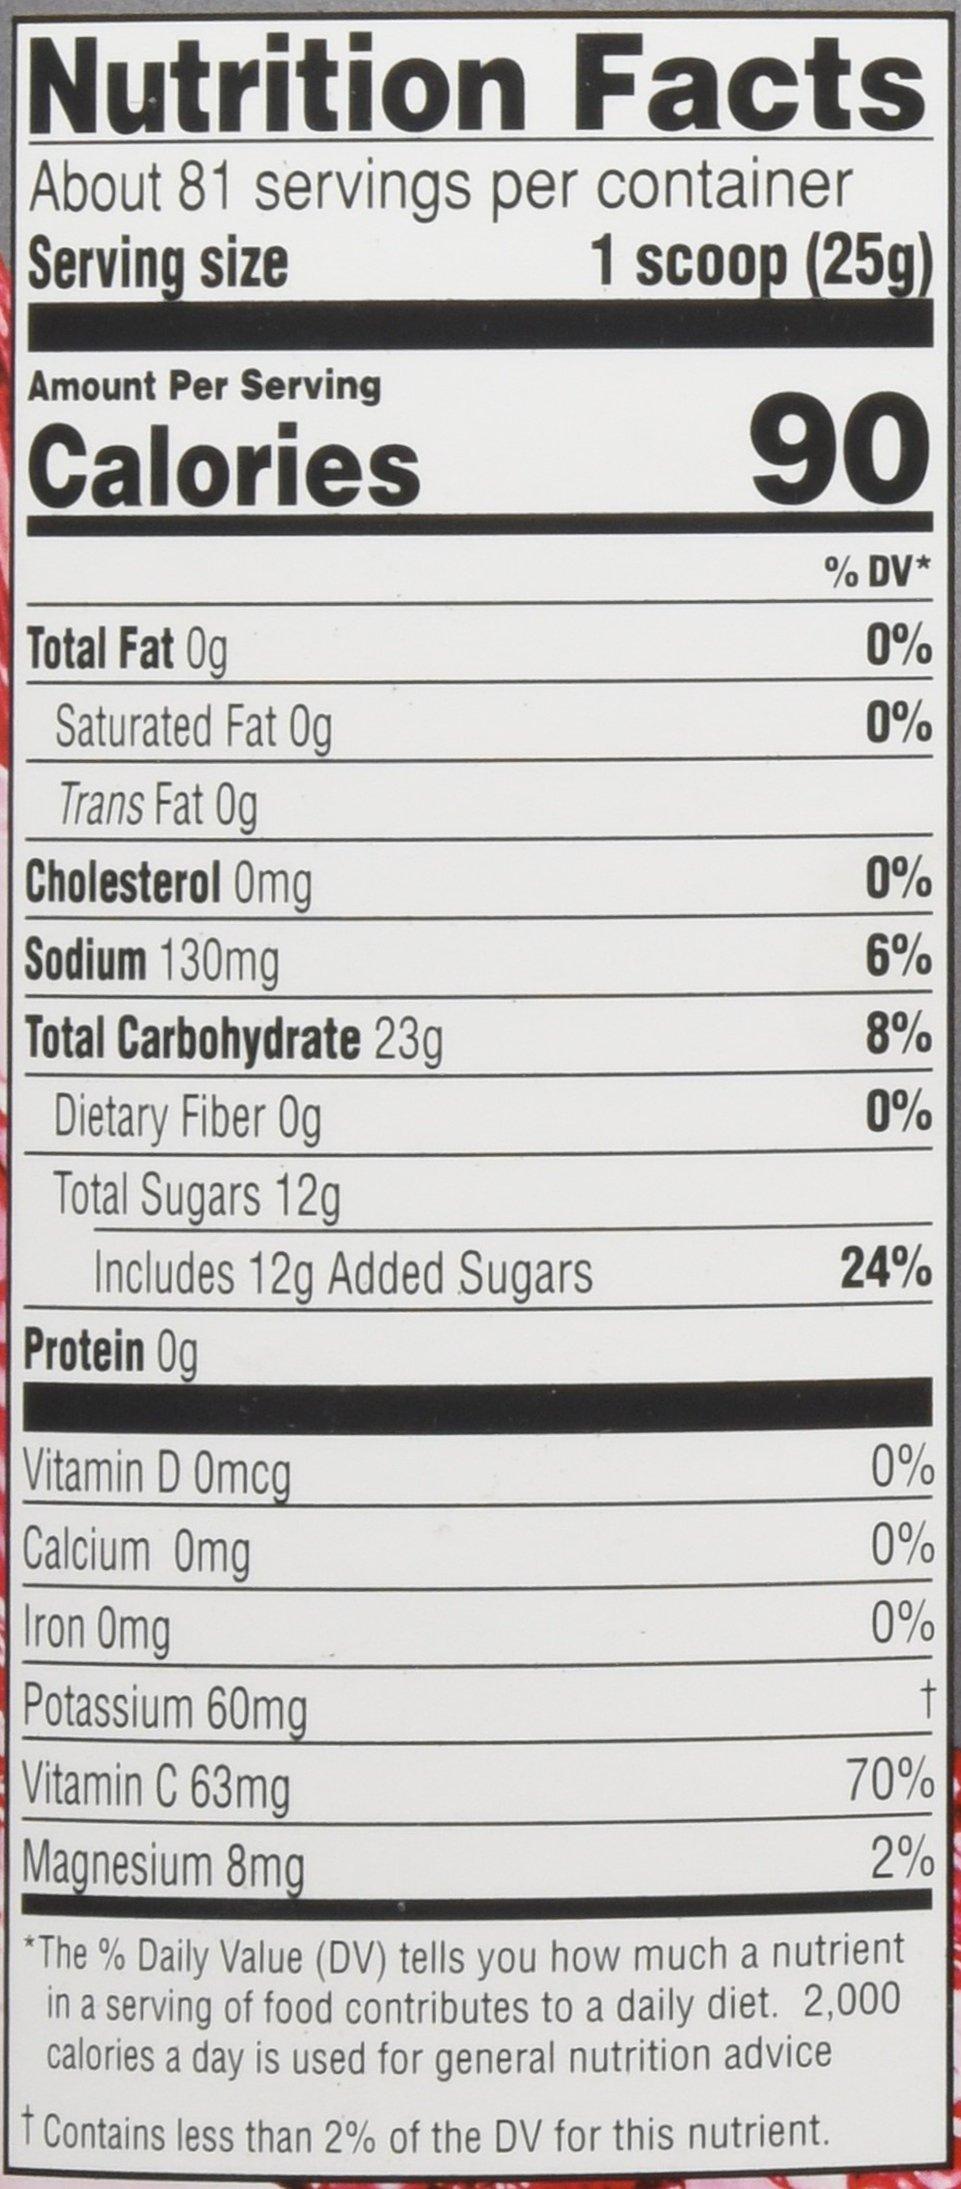 CytoSport Cytomax Sports Performance Mix, Tropical Fruit, 4.5 Pound by CytoSport (Image #2)